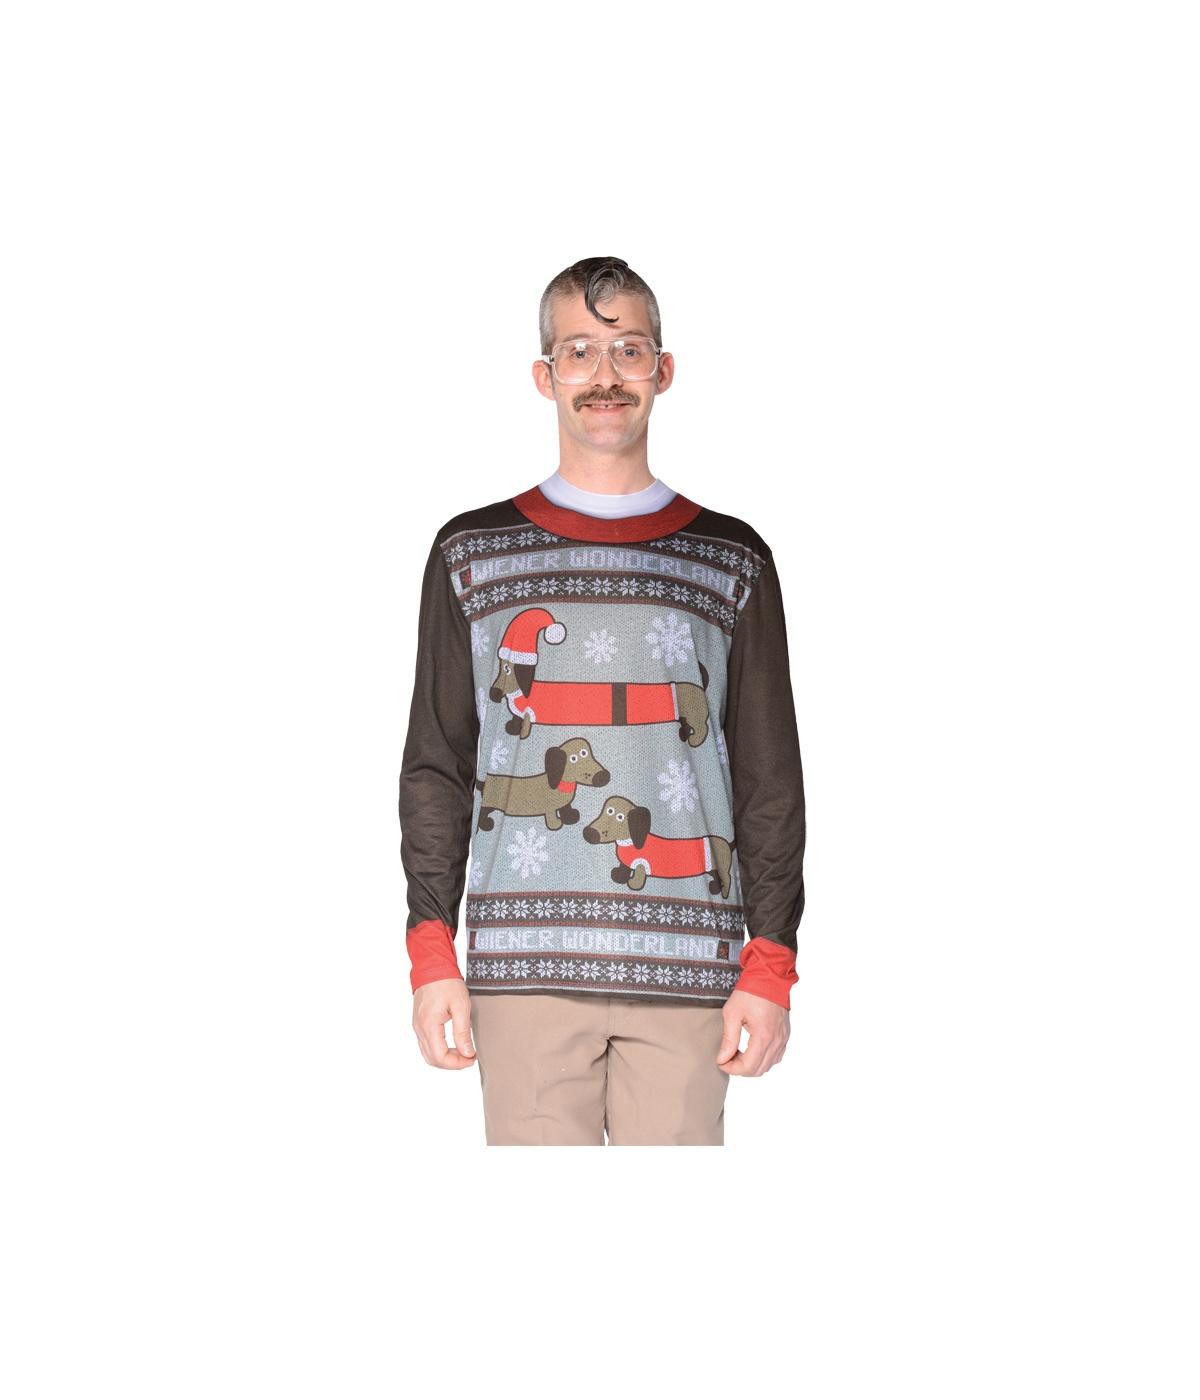 651aa7e0725 Ugly Christmas Wiener Dog Wonderland Sweater Shirt - Christmas ...